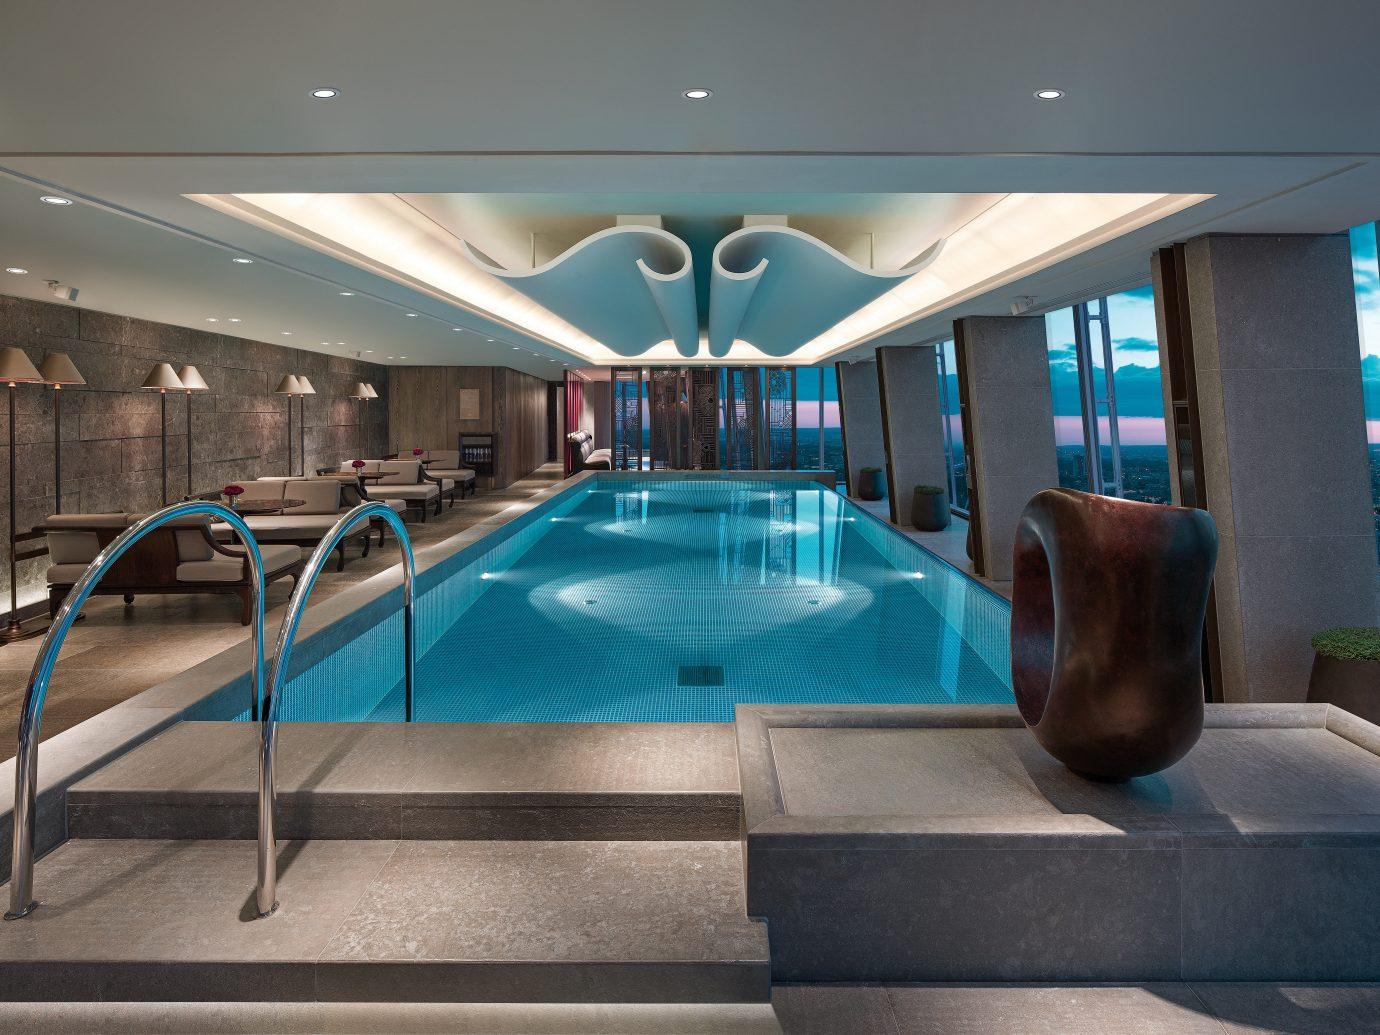 Infinity Pool At Shangri-La Hotel - The Shard In London